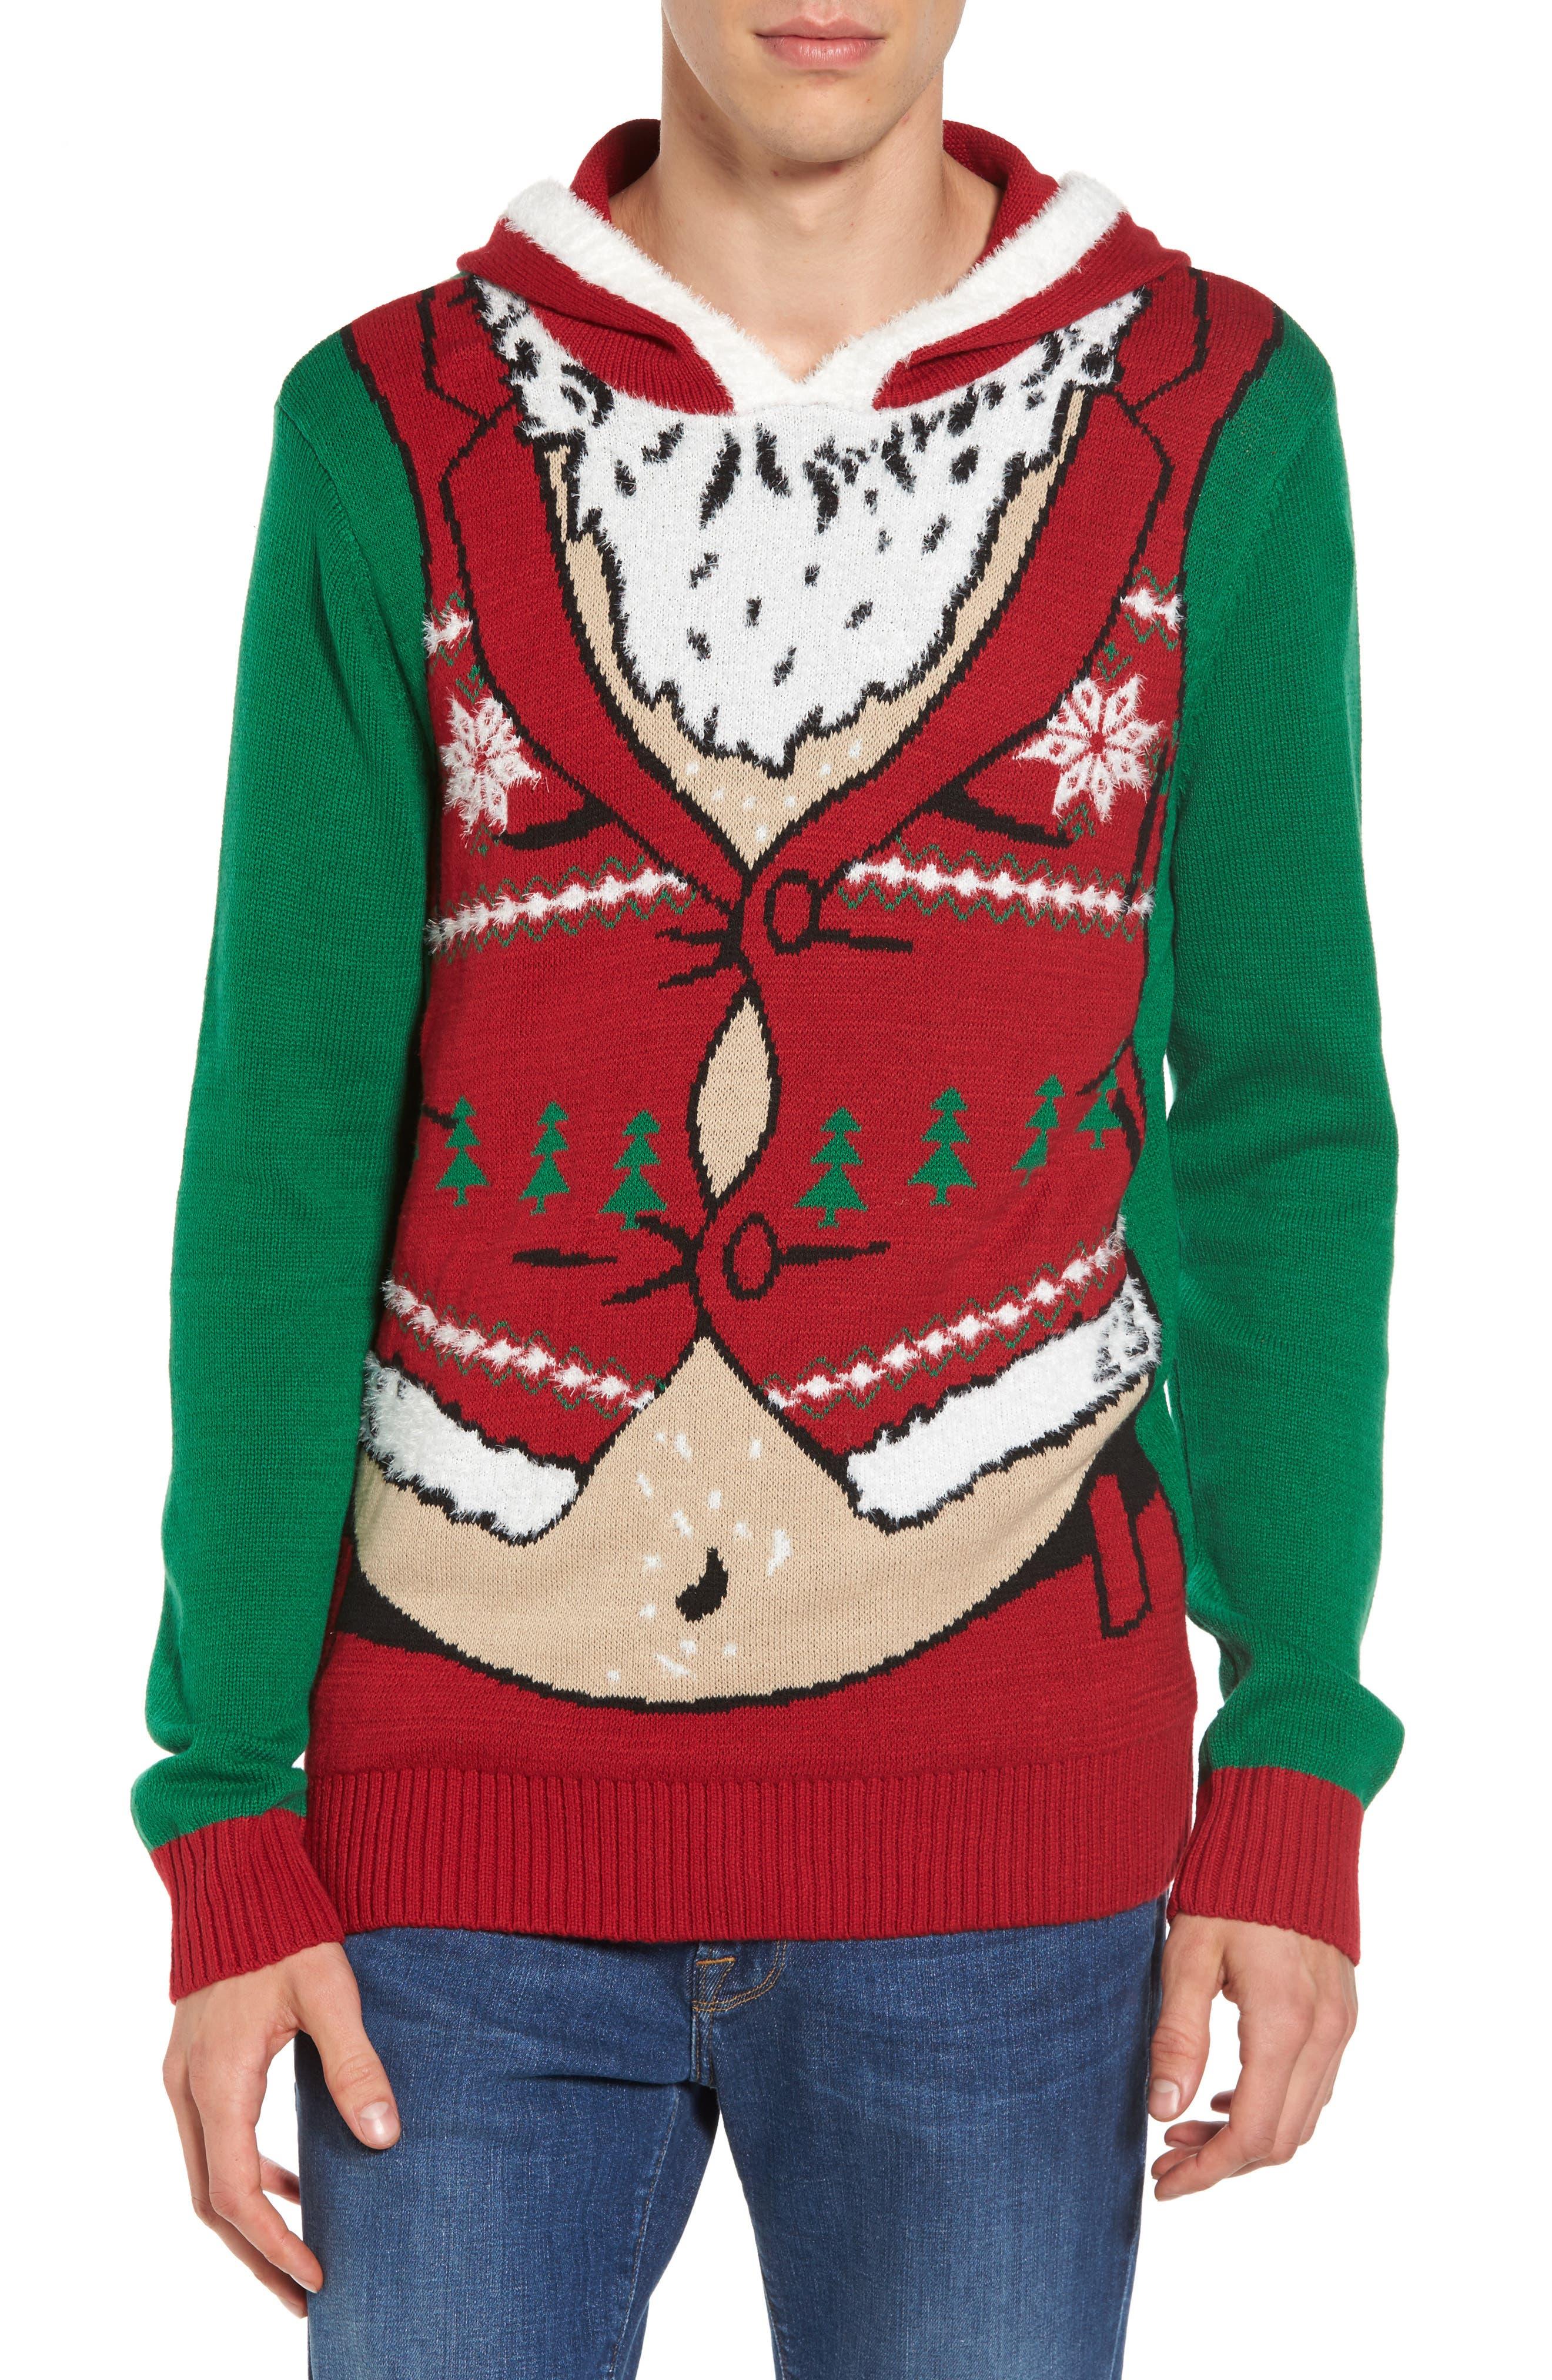 Santa Hoodie Sweater,                             Main thumbnail 1, color,                             Green Santa